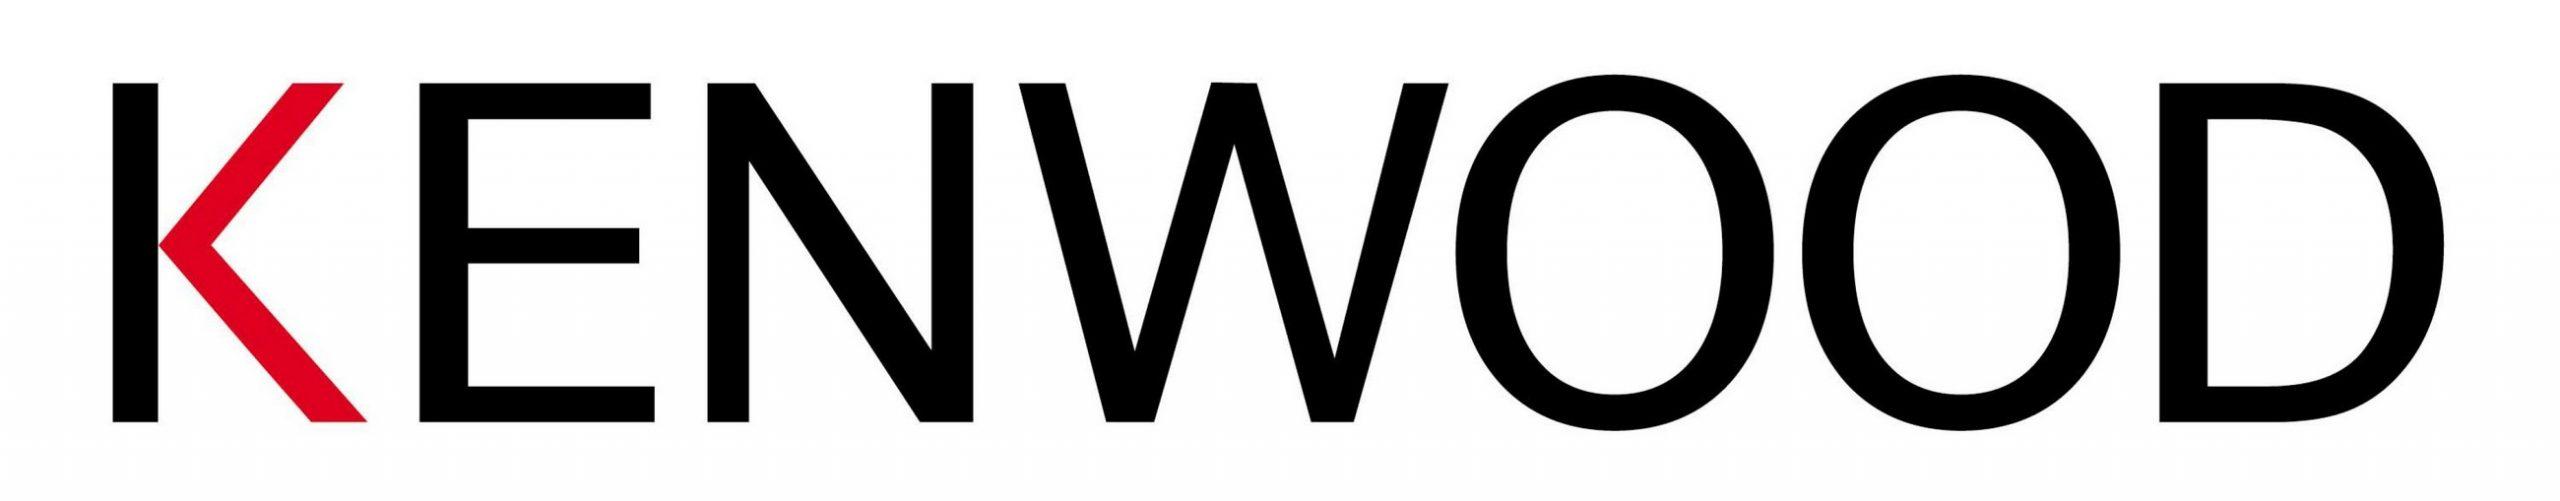 kenwood-logo - 2